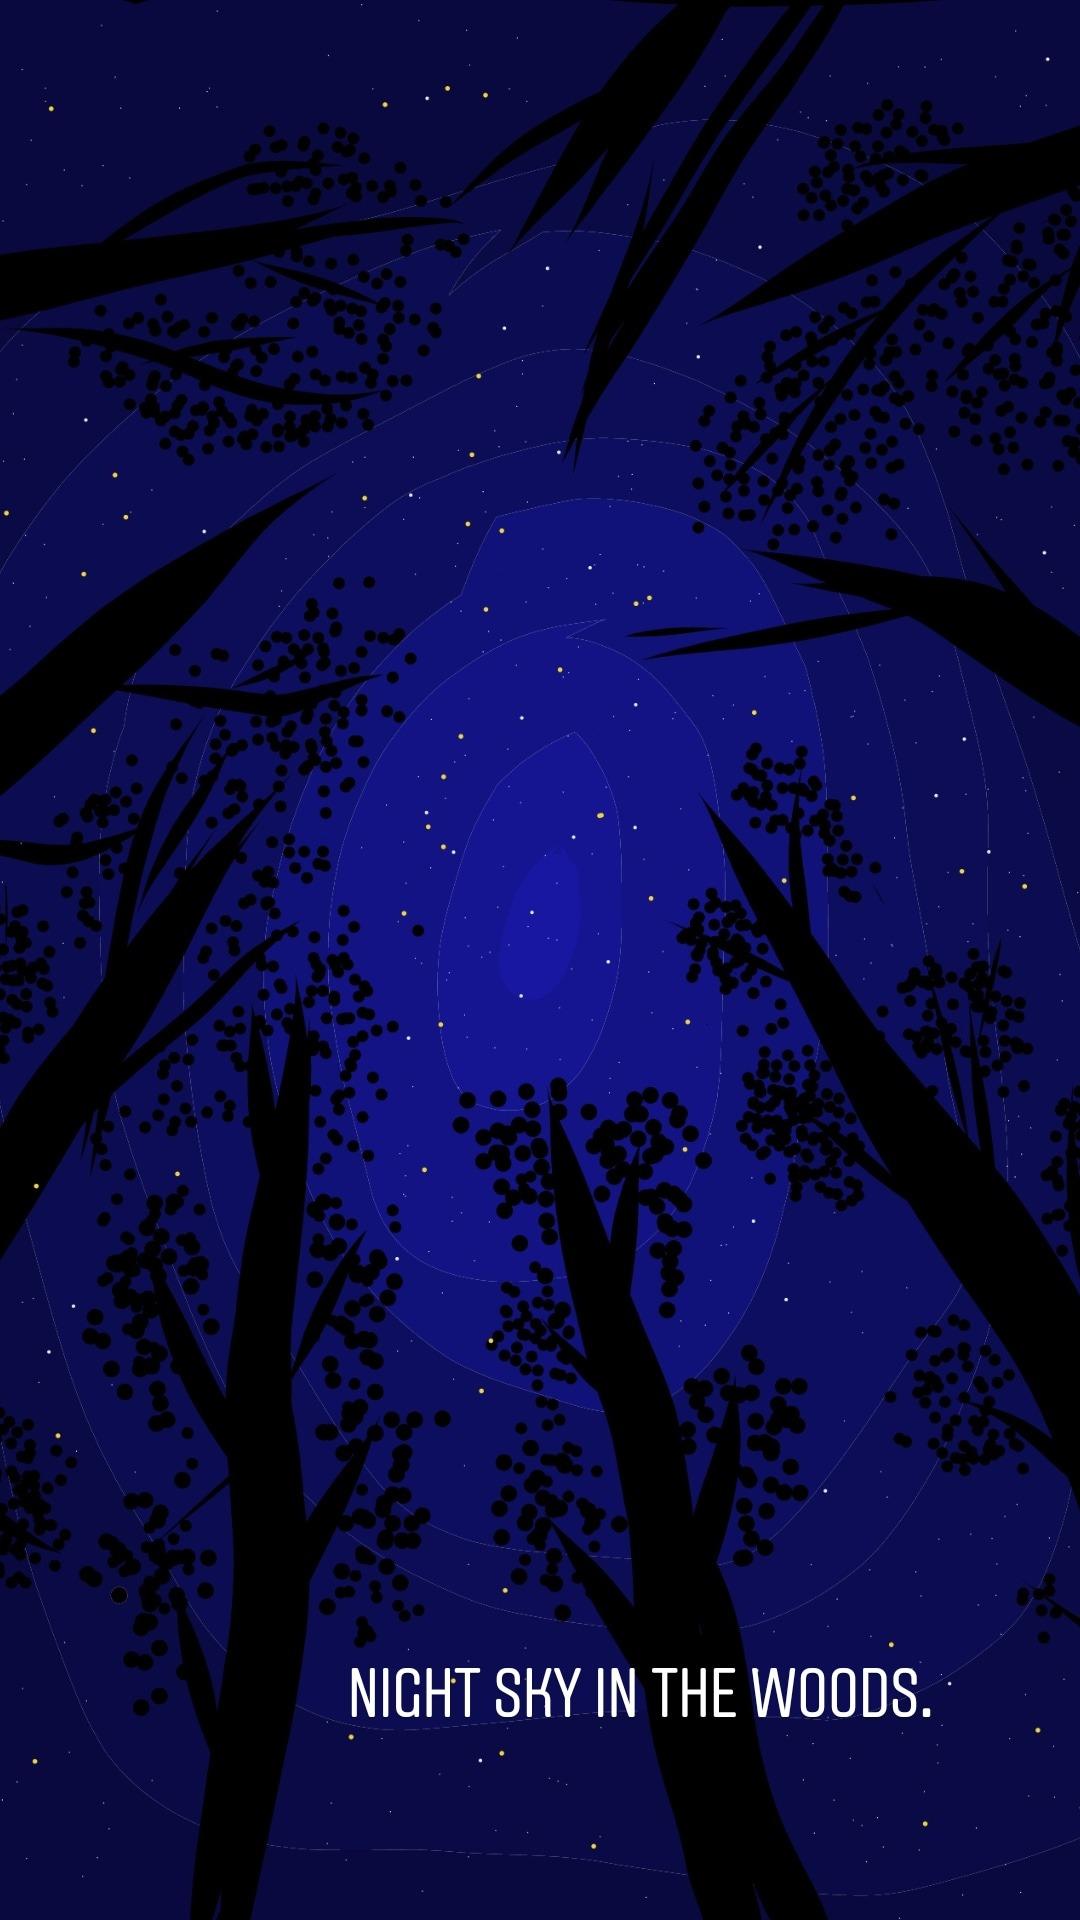 Night scene in the woods Image